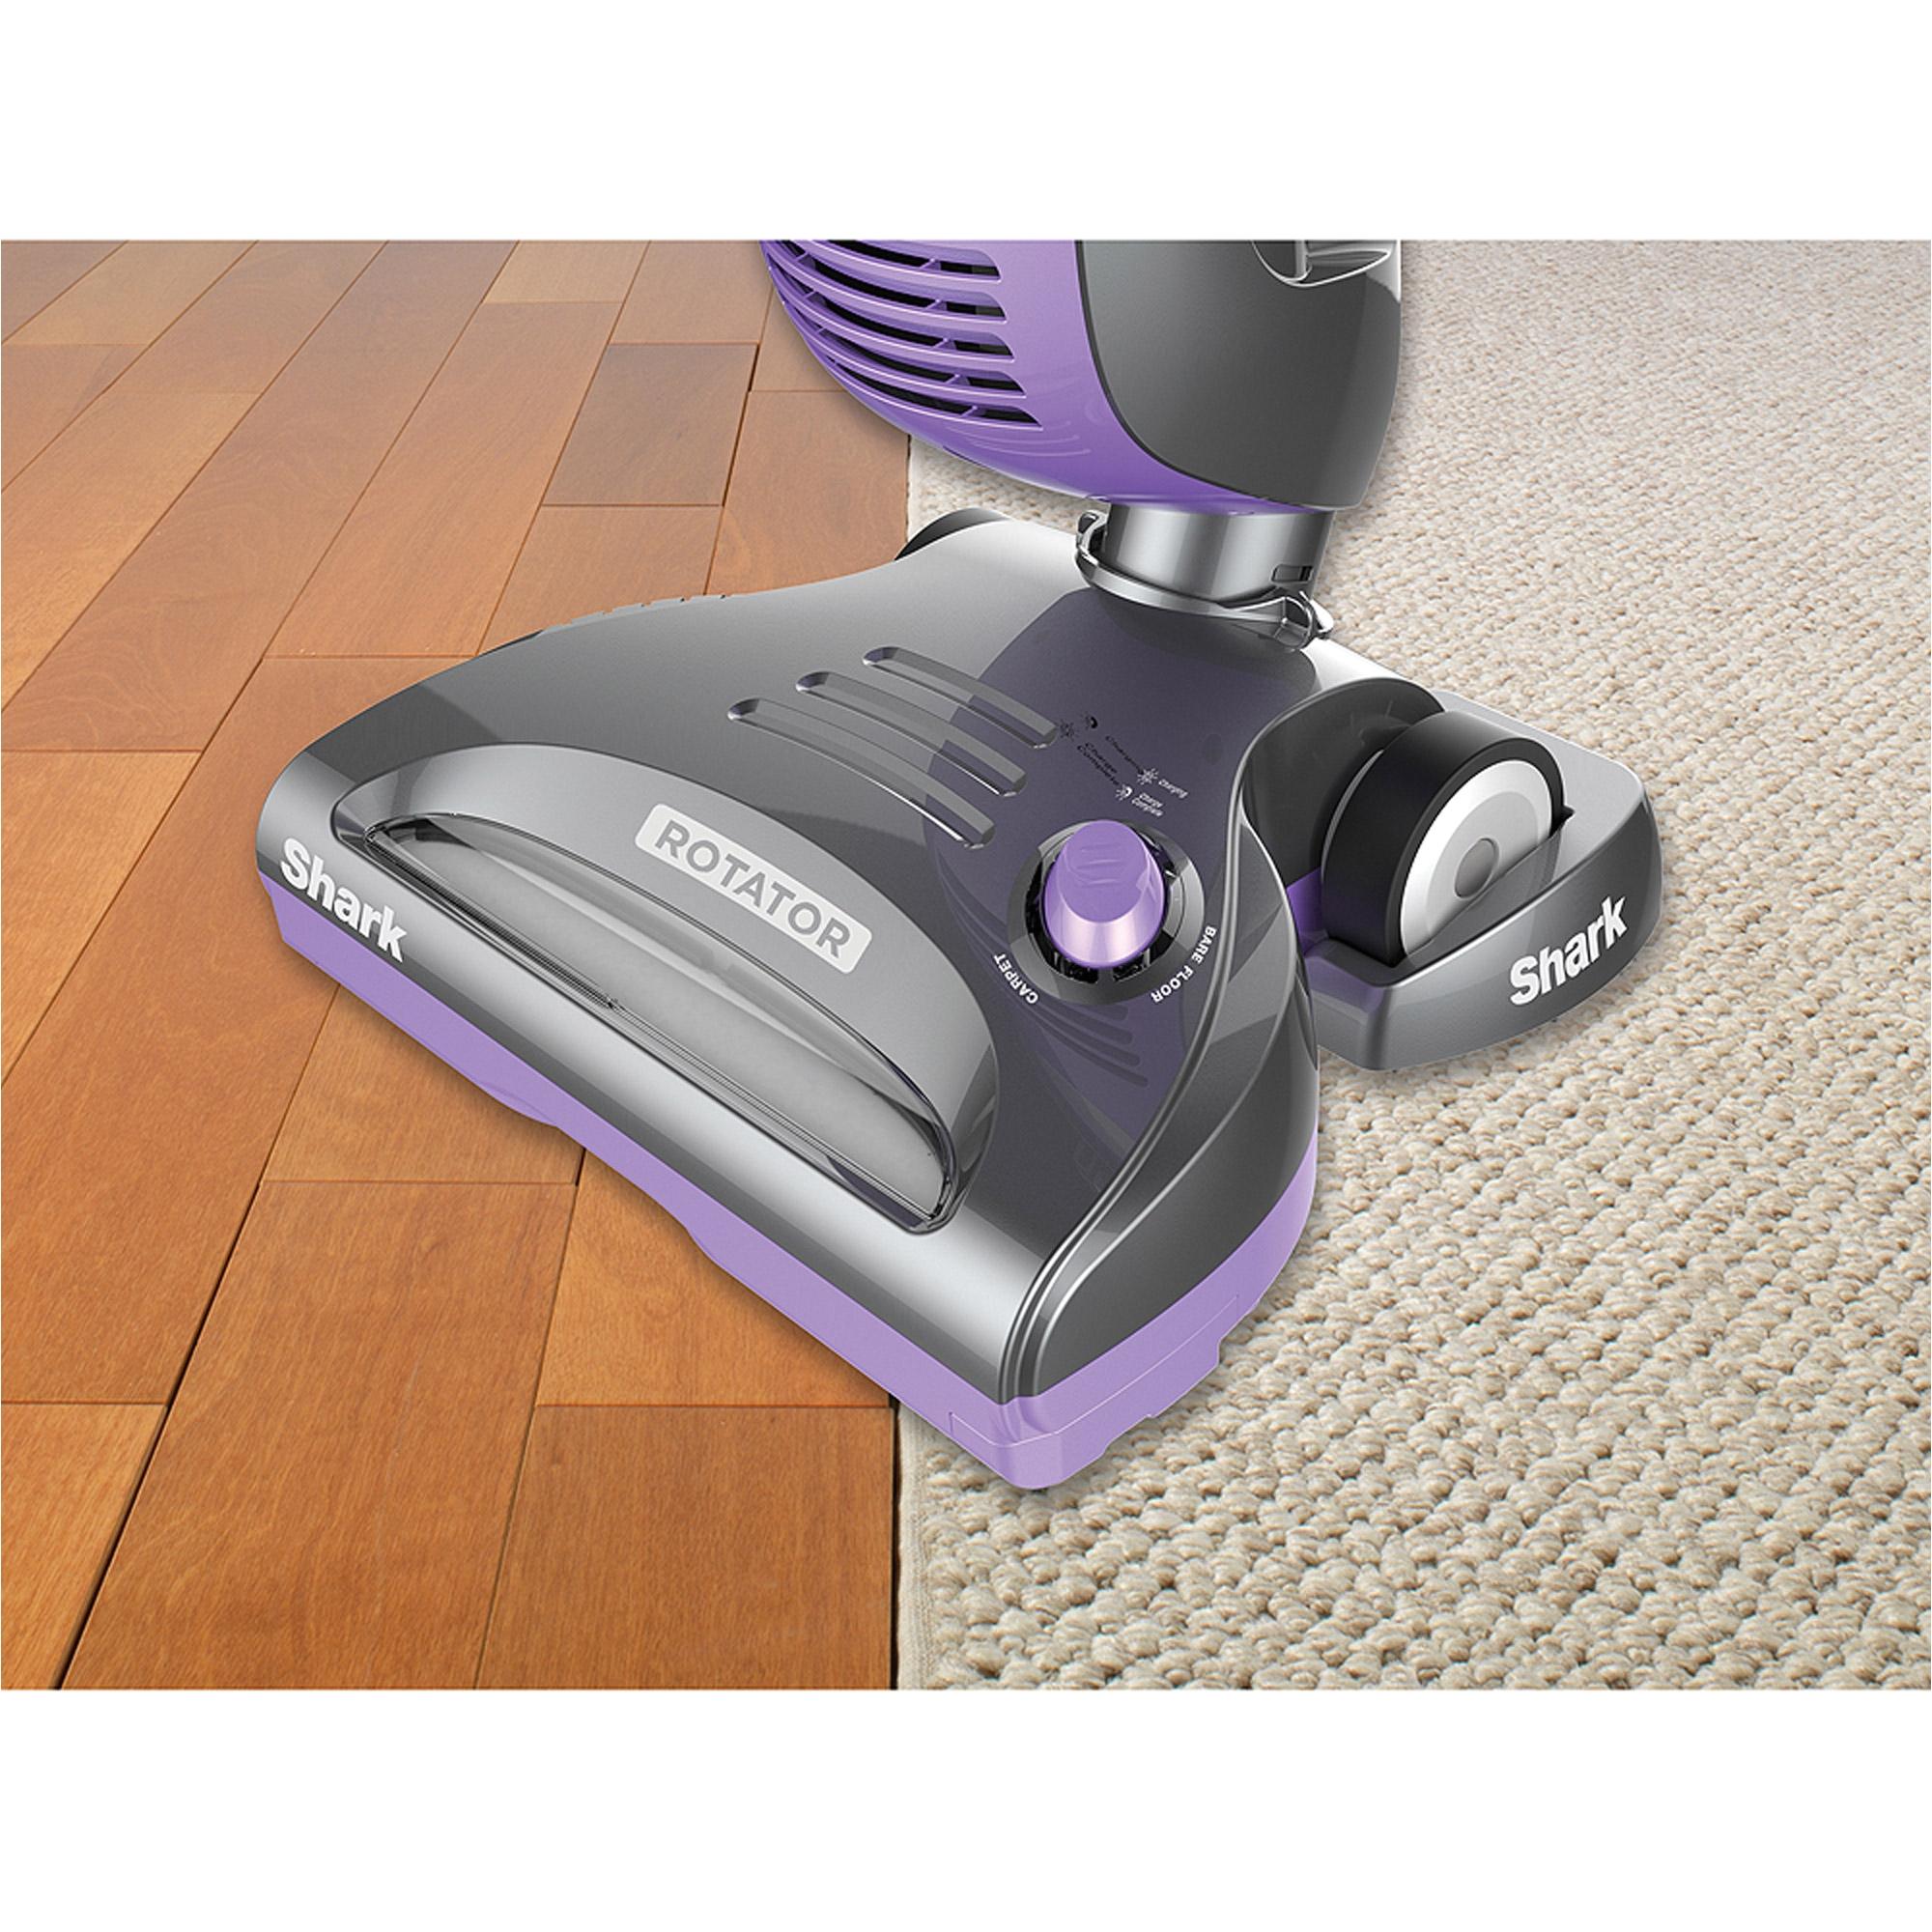 affordable cordless vacuum sv lb with carpet vacuum